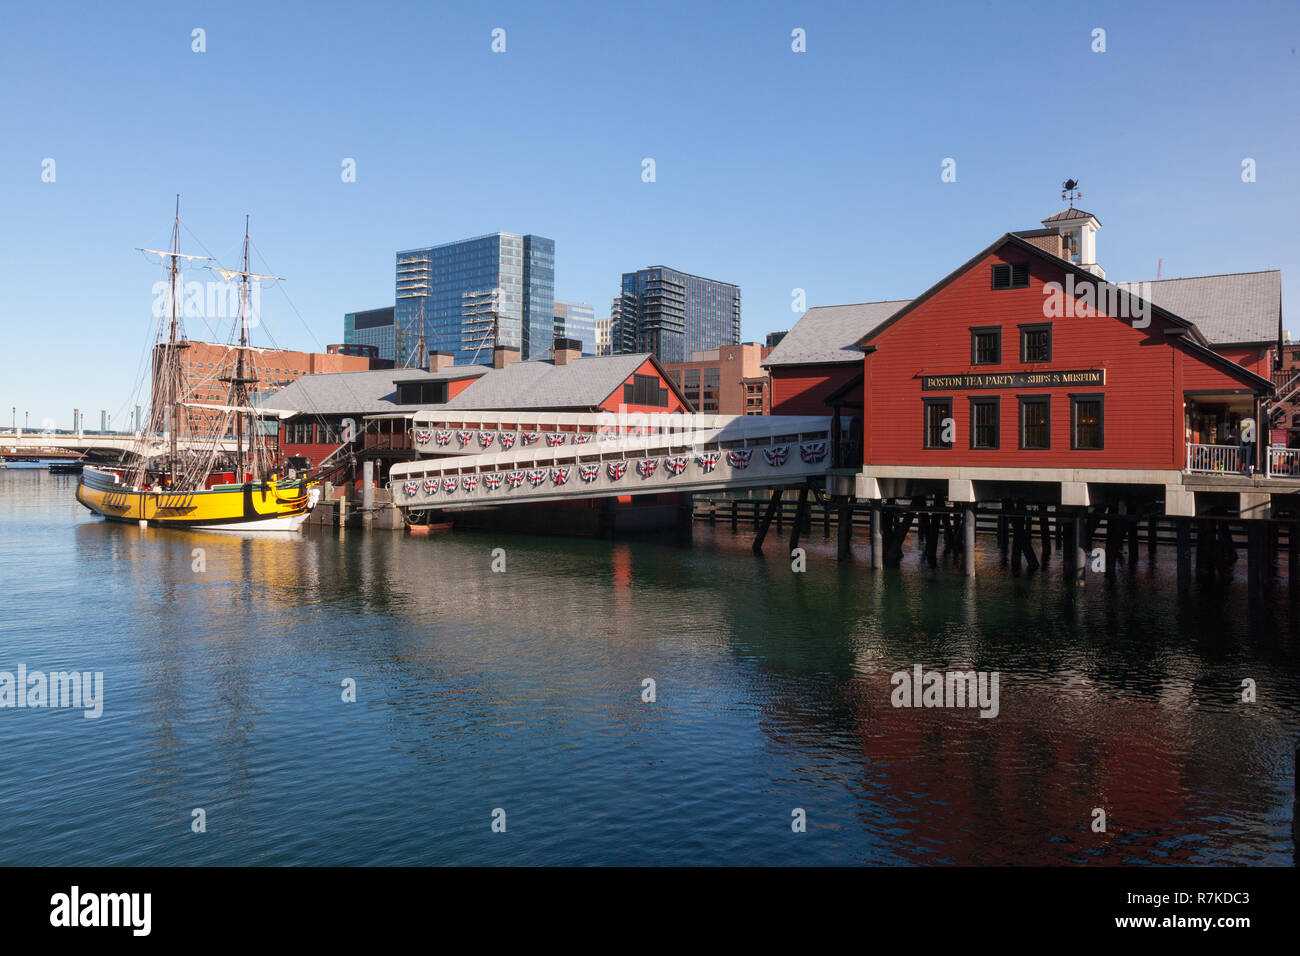 Boston Tea Party Ships & Museum,  306 Congress St, Boston,Massachusetts, United States of America. - Stock Image